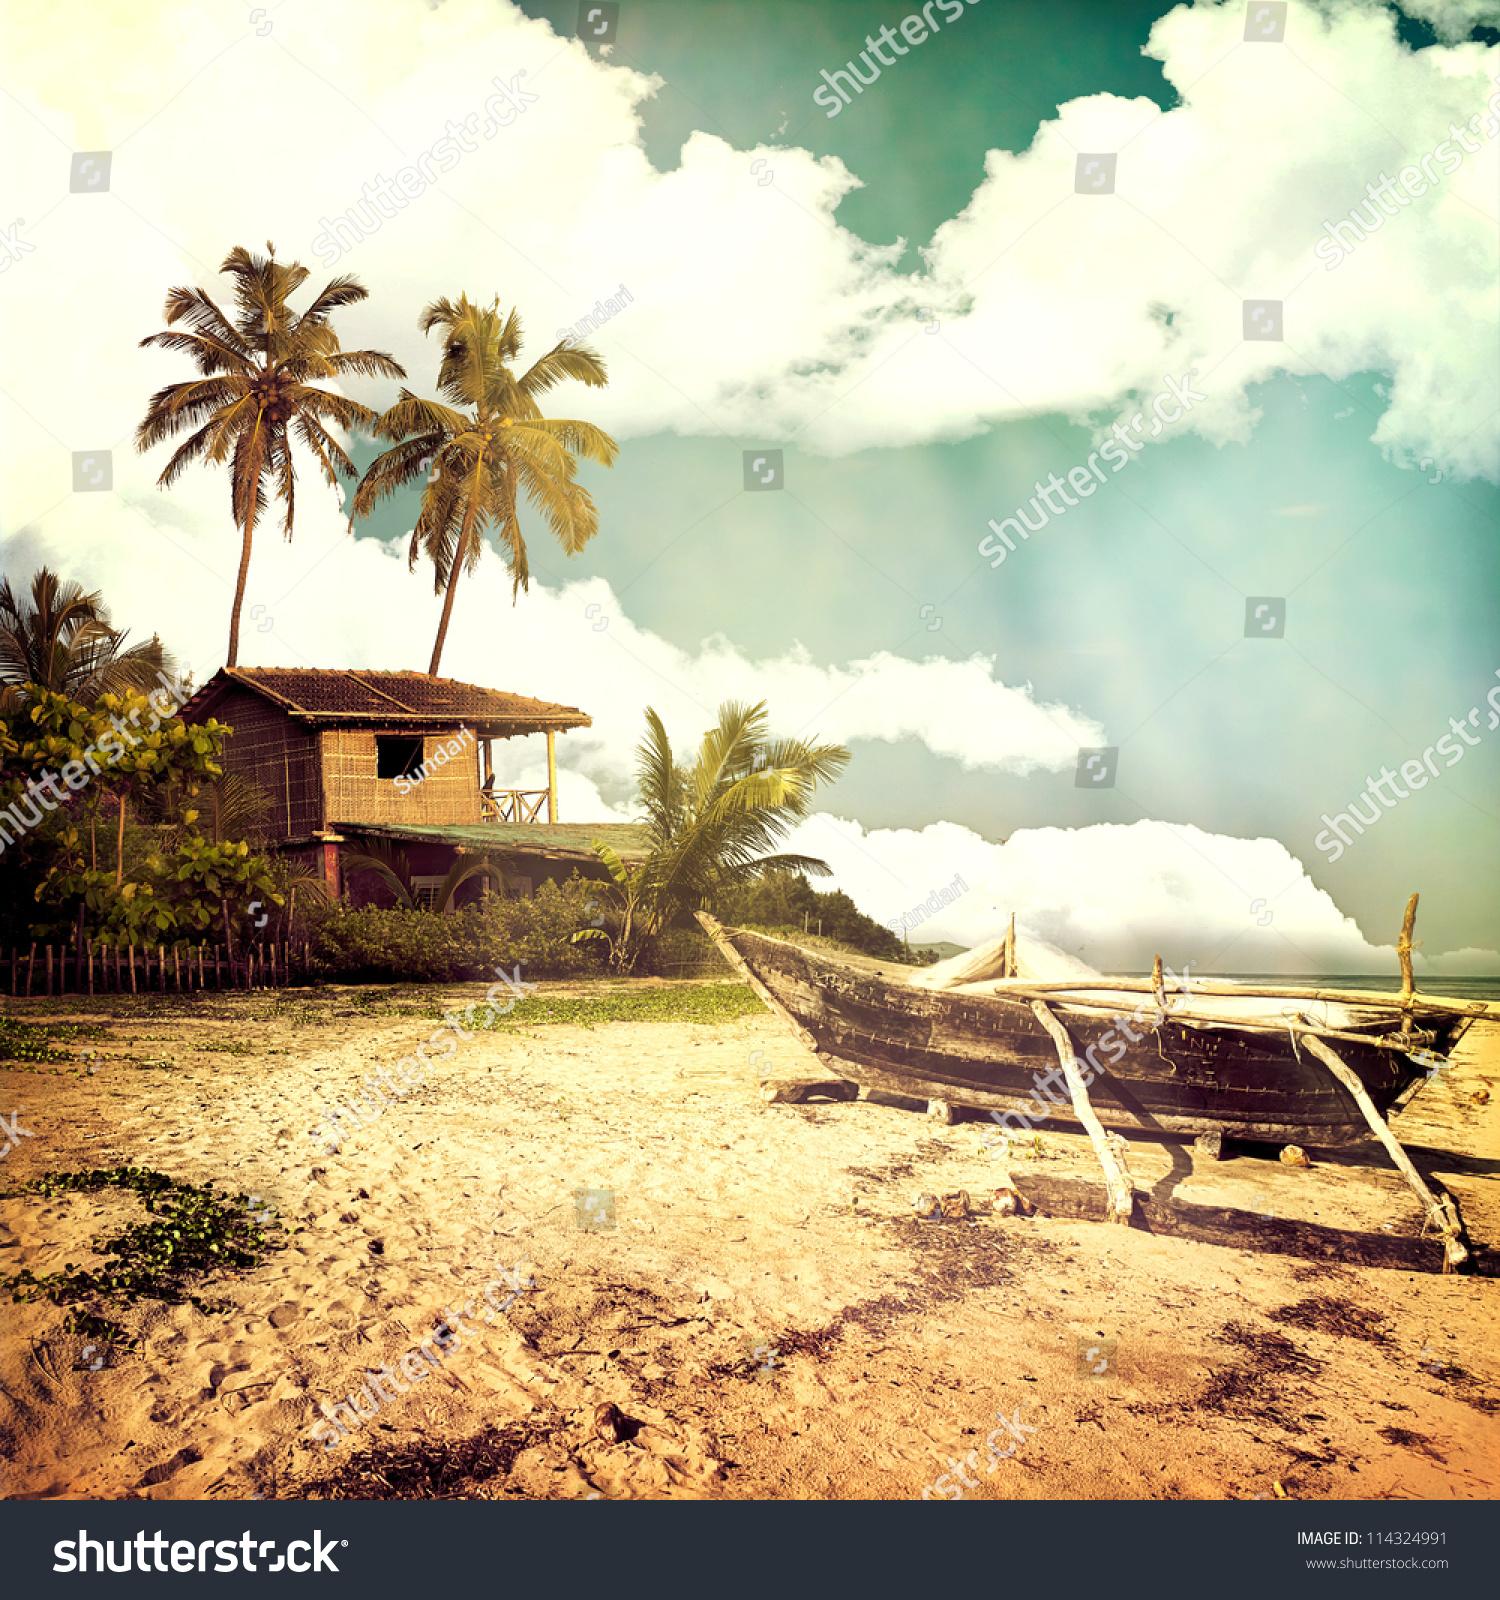 Vintage Beach Background Stock Photo 112981333: Vintage Beach Background Stock Photo 114324991 : Shutterstock